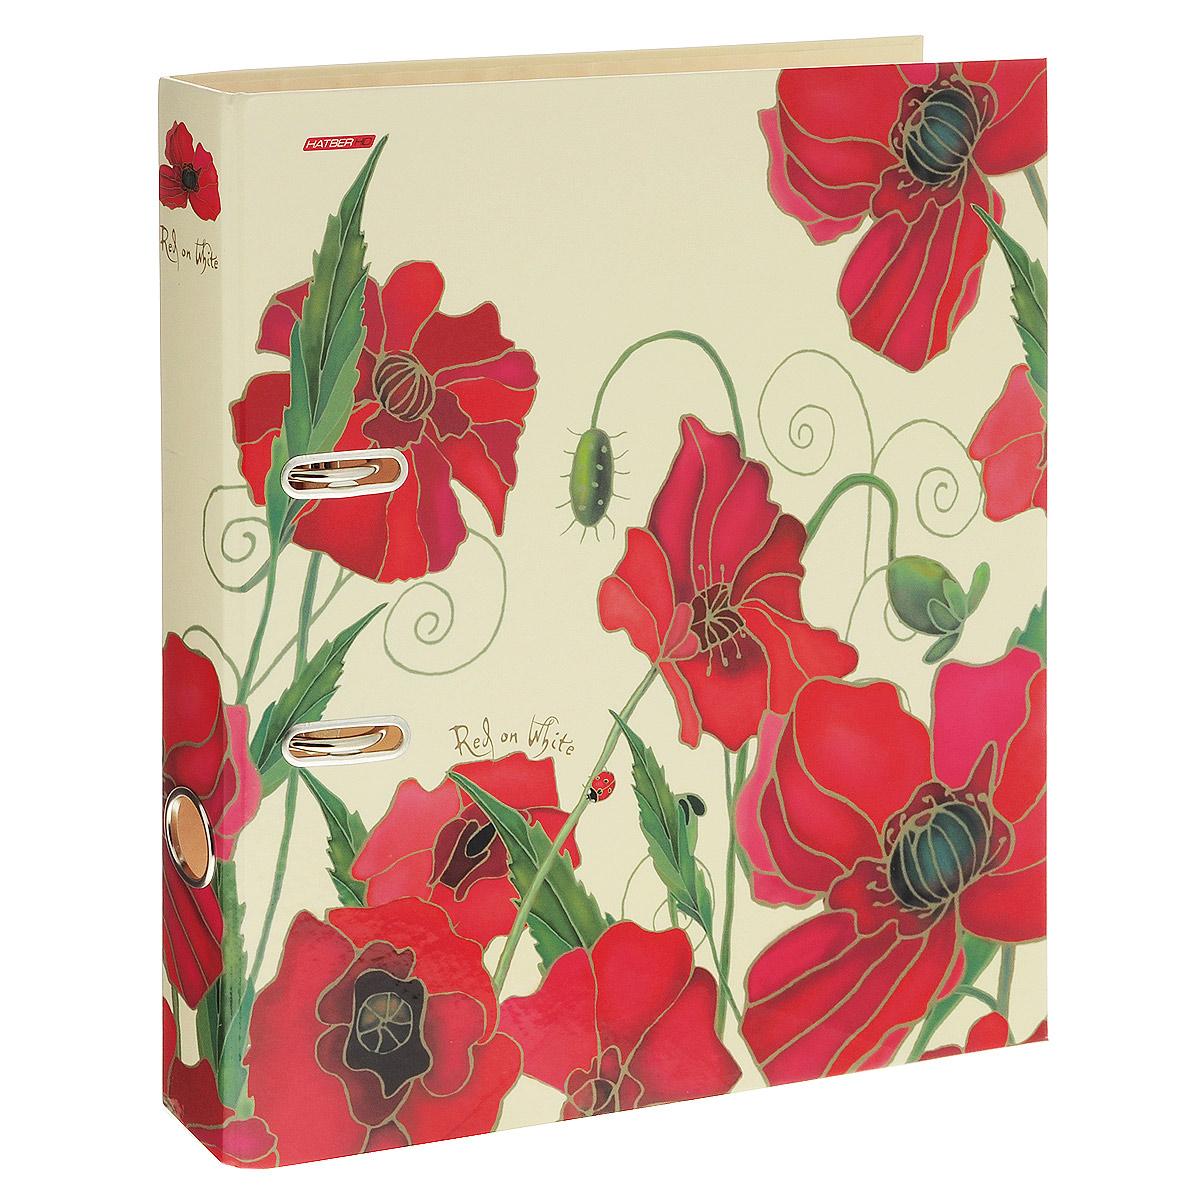 Папка-регистратор Hatber Red on White, ширина корешка 45 мм, цвет: бежевый, красный папка регистратор hatber red on black ширина корешка 70 мм цвет черный красный